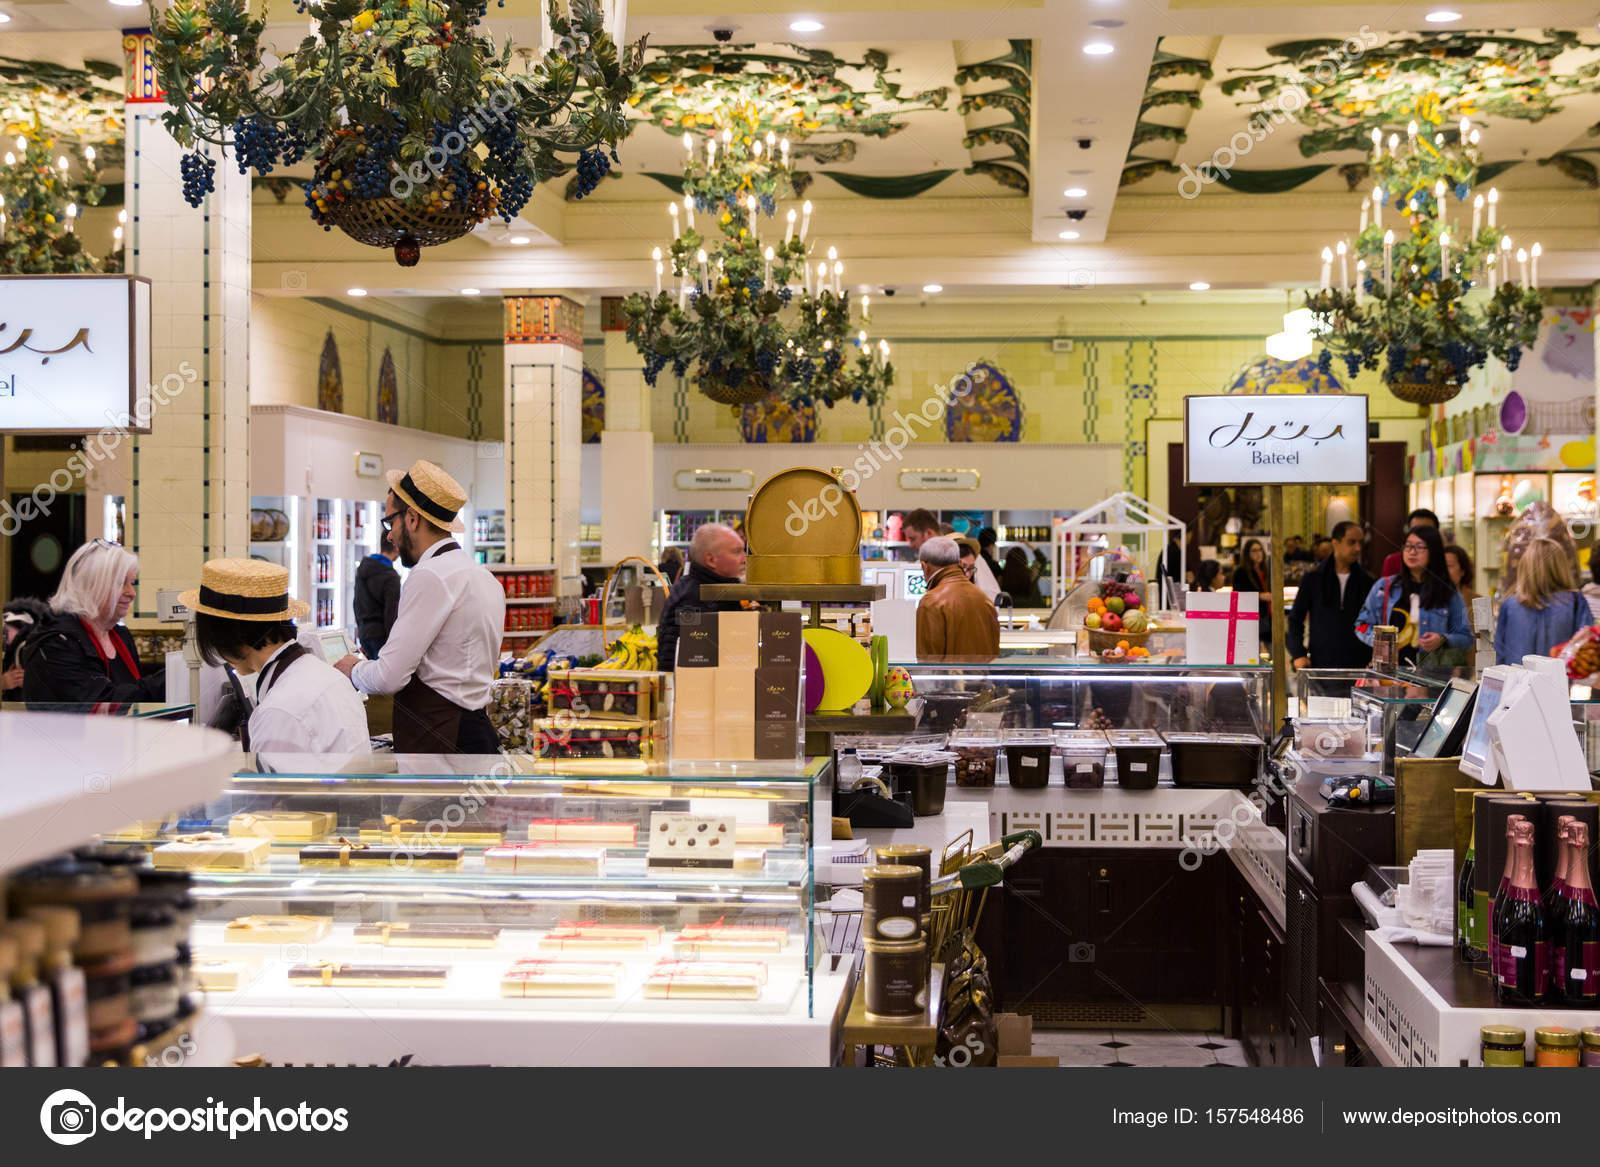 londen engeland 4 april 2017 harrods warenhuis interieur snoep en snoep gebied